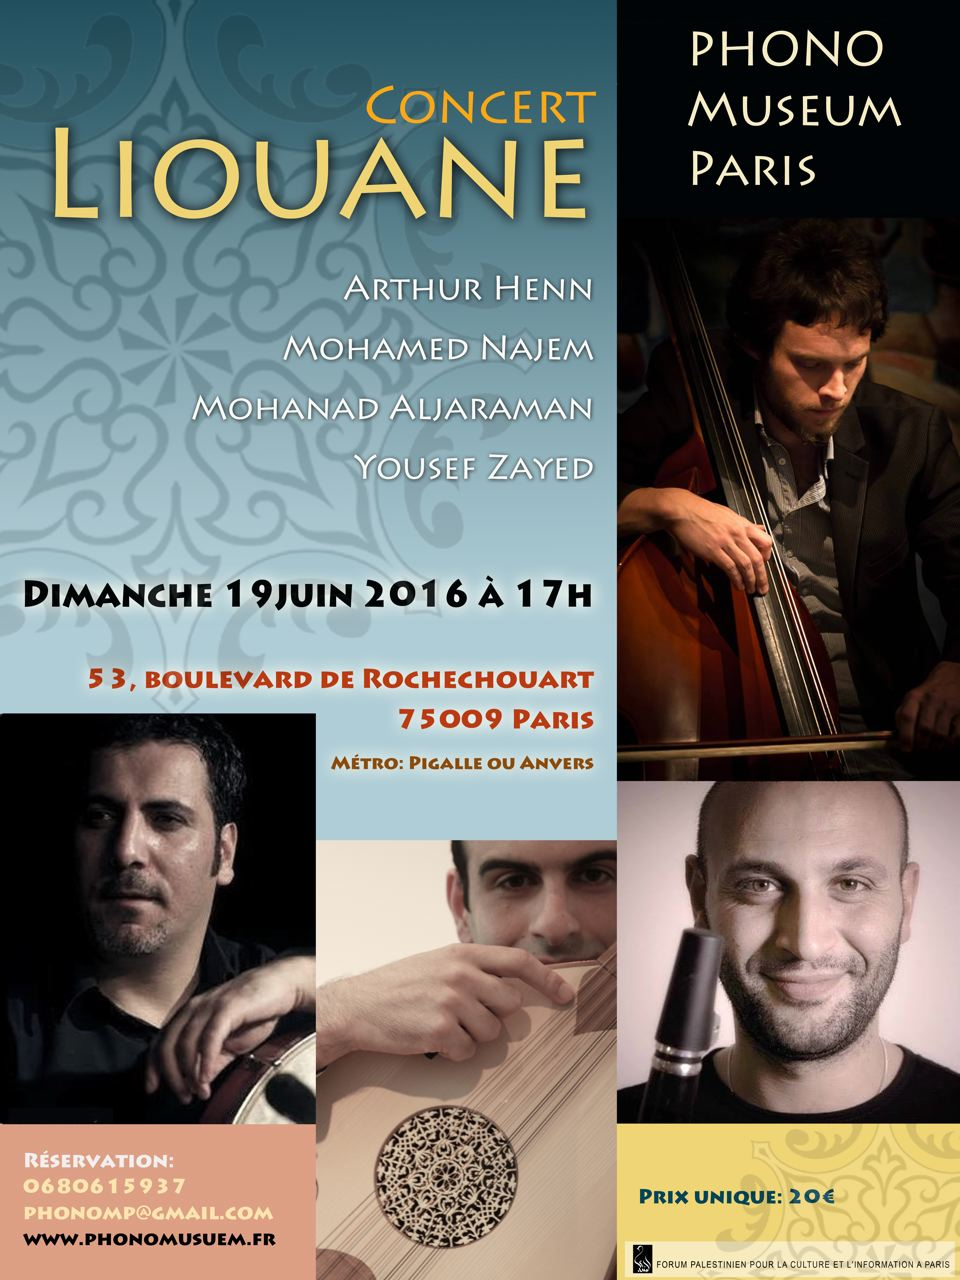 Yousef louane